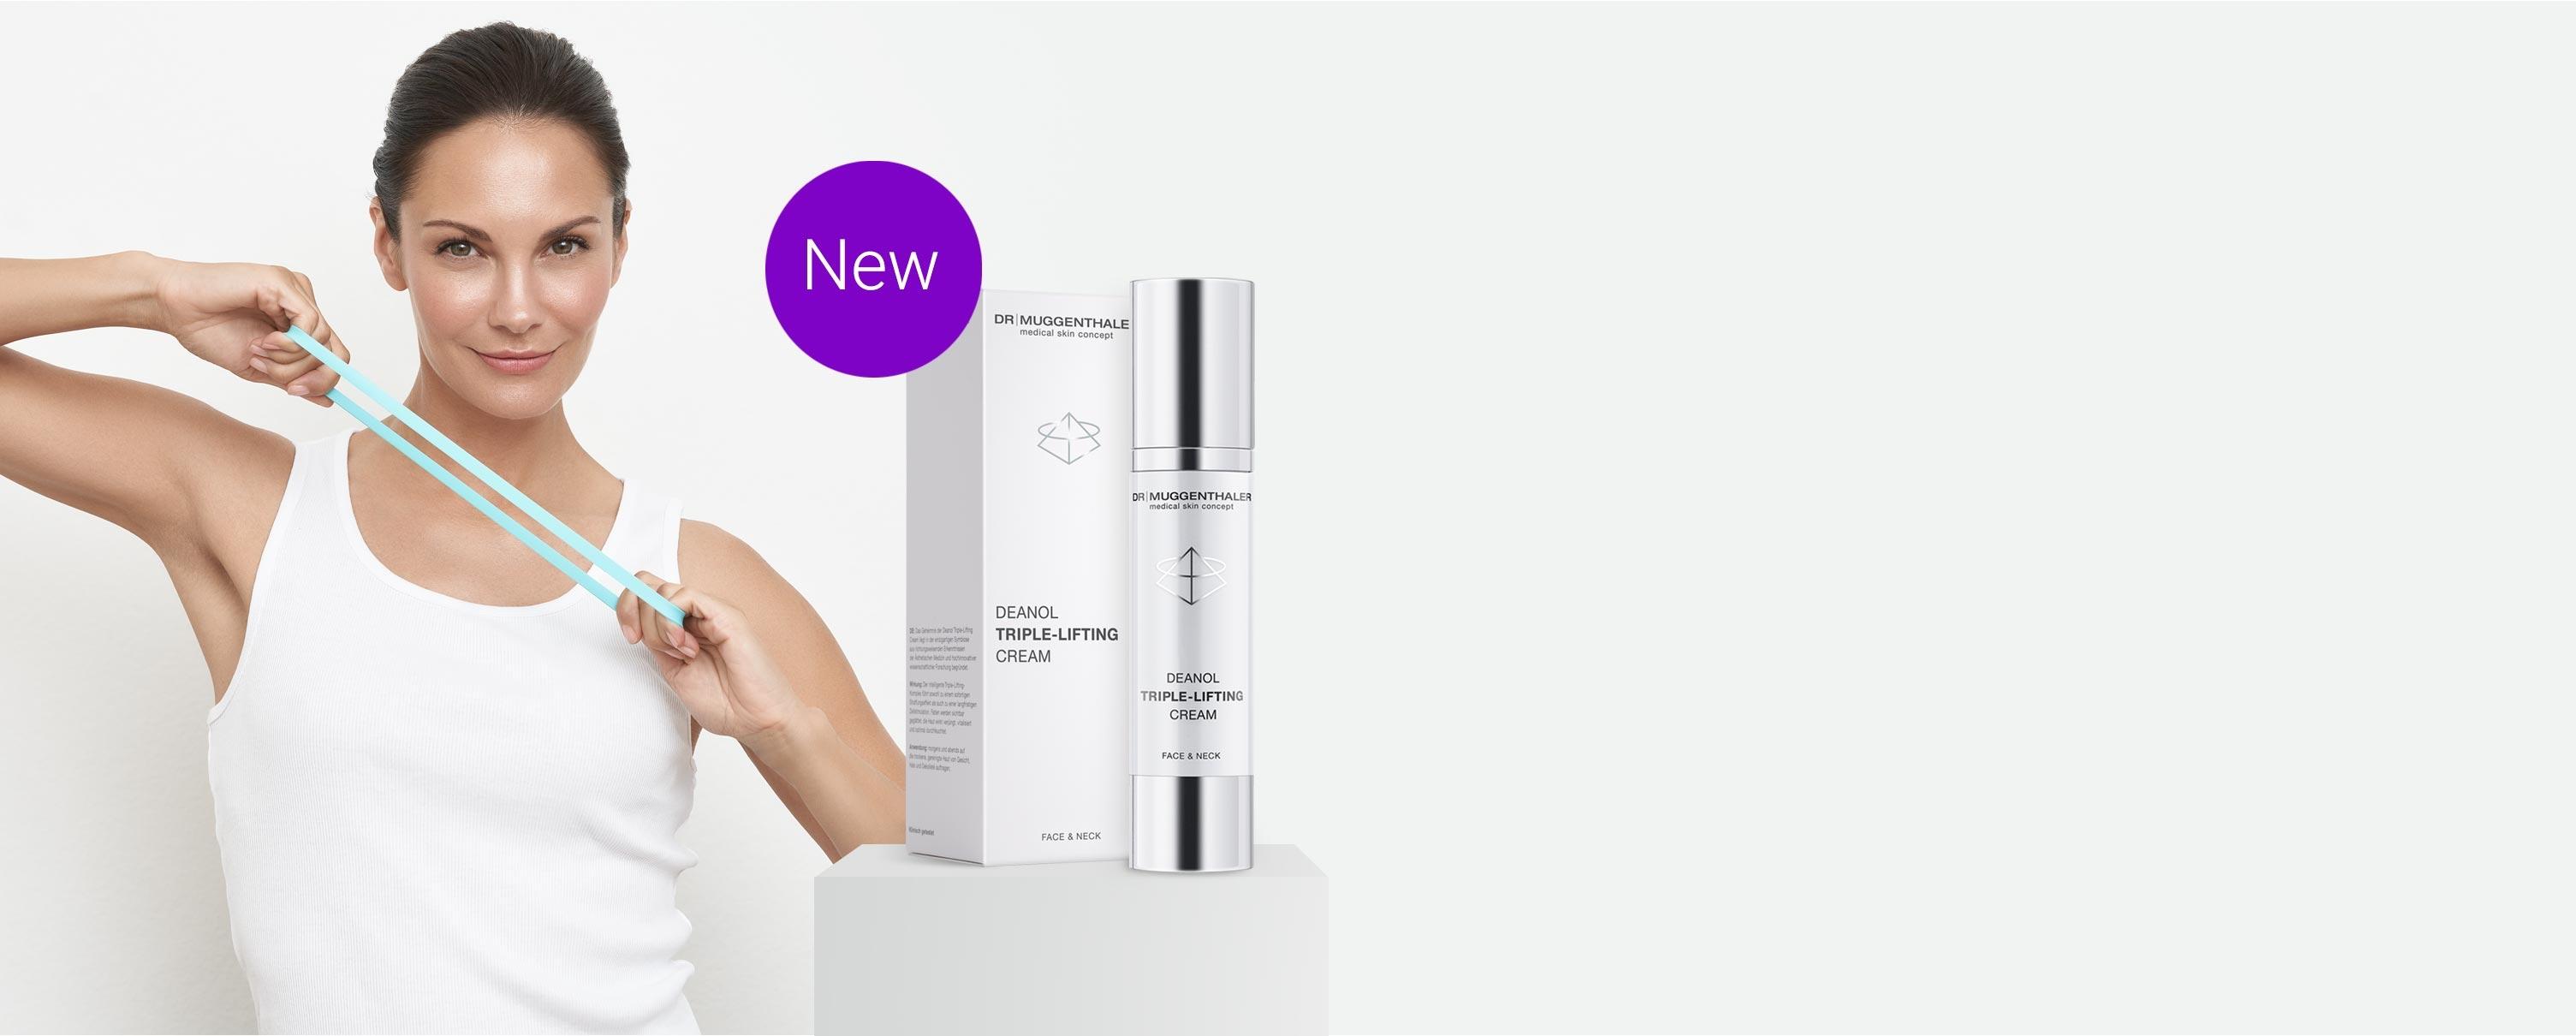 The new Deanol Triple-Lifting Cream by Dr. Muggenthaler